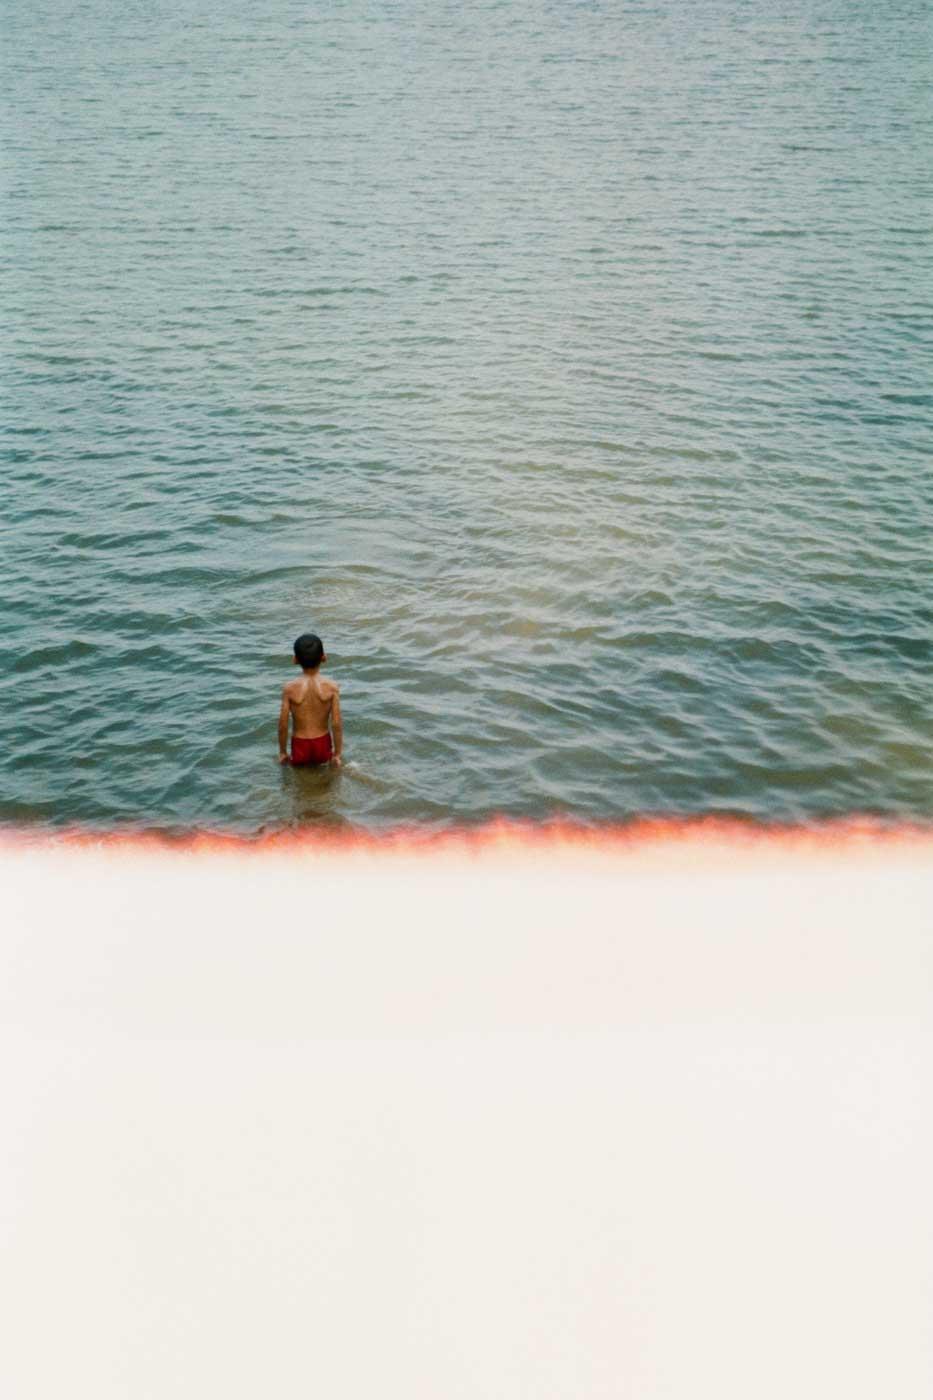 Leica-Summicron-50mm-50-f2-Rigid-Type-2-II-lens-review-cambodia-siem-reap-fujifilm-superia-premium-400-kid-standing-in-water-lake